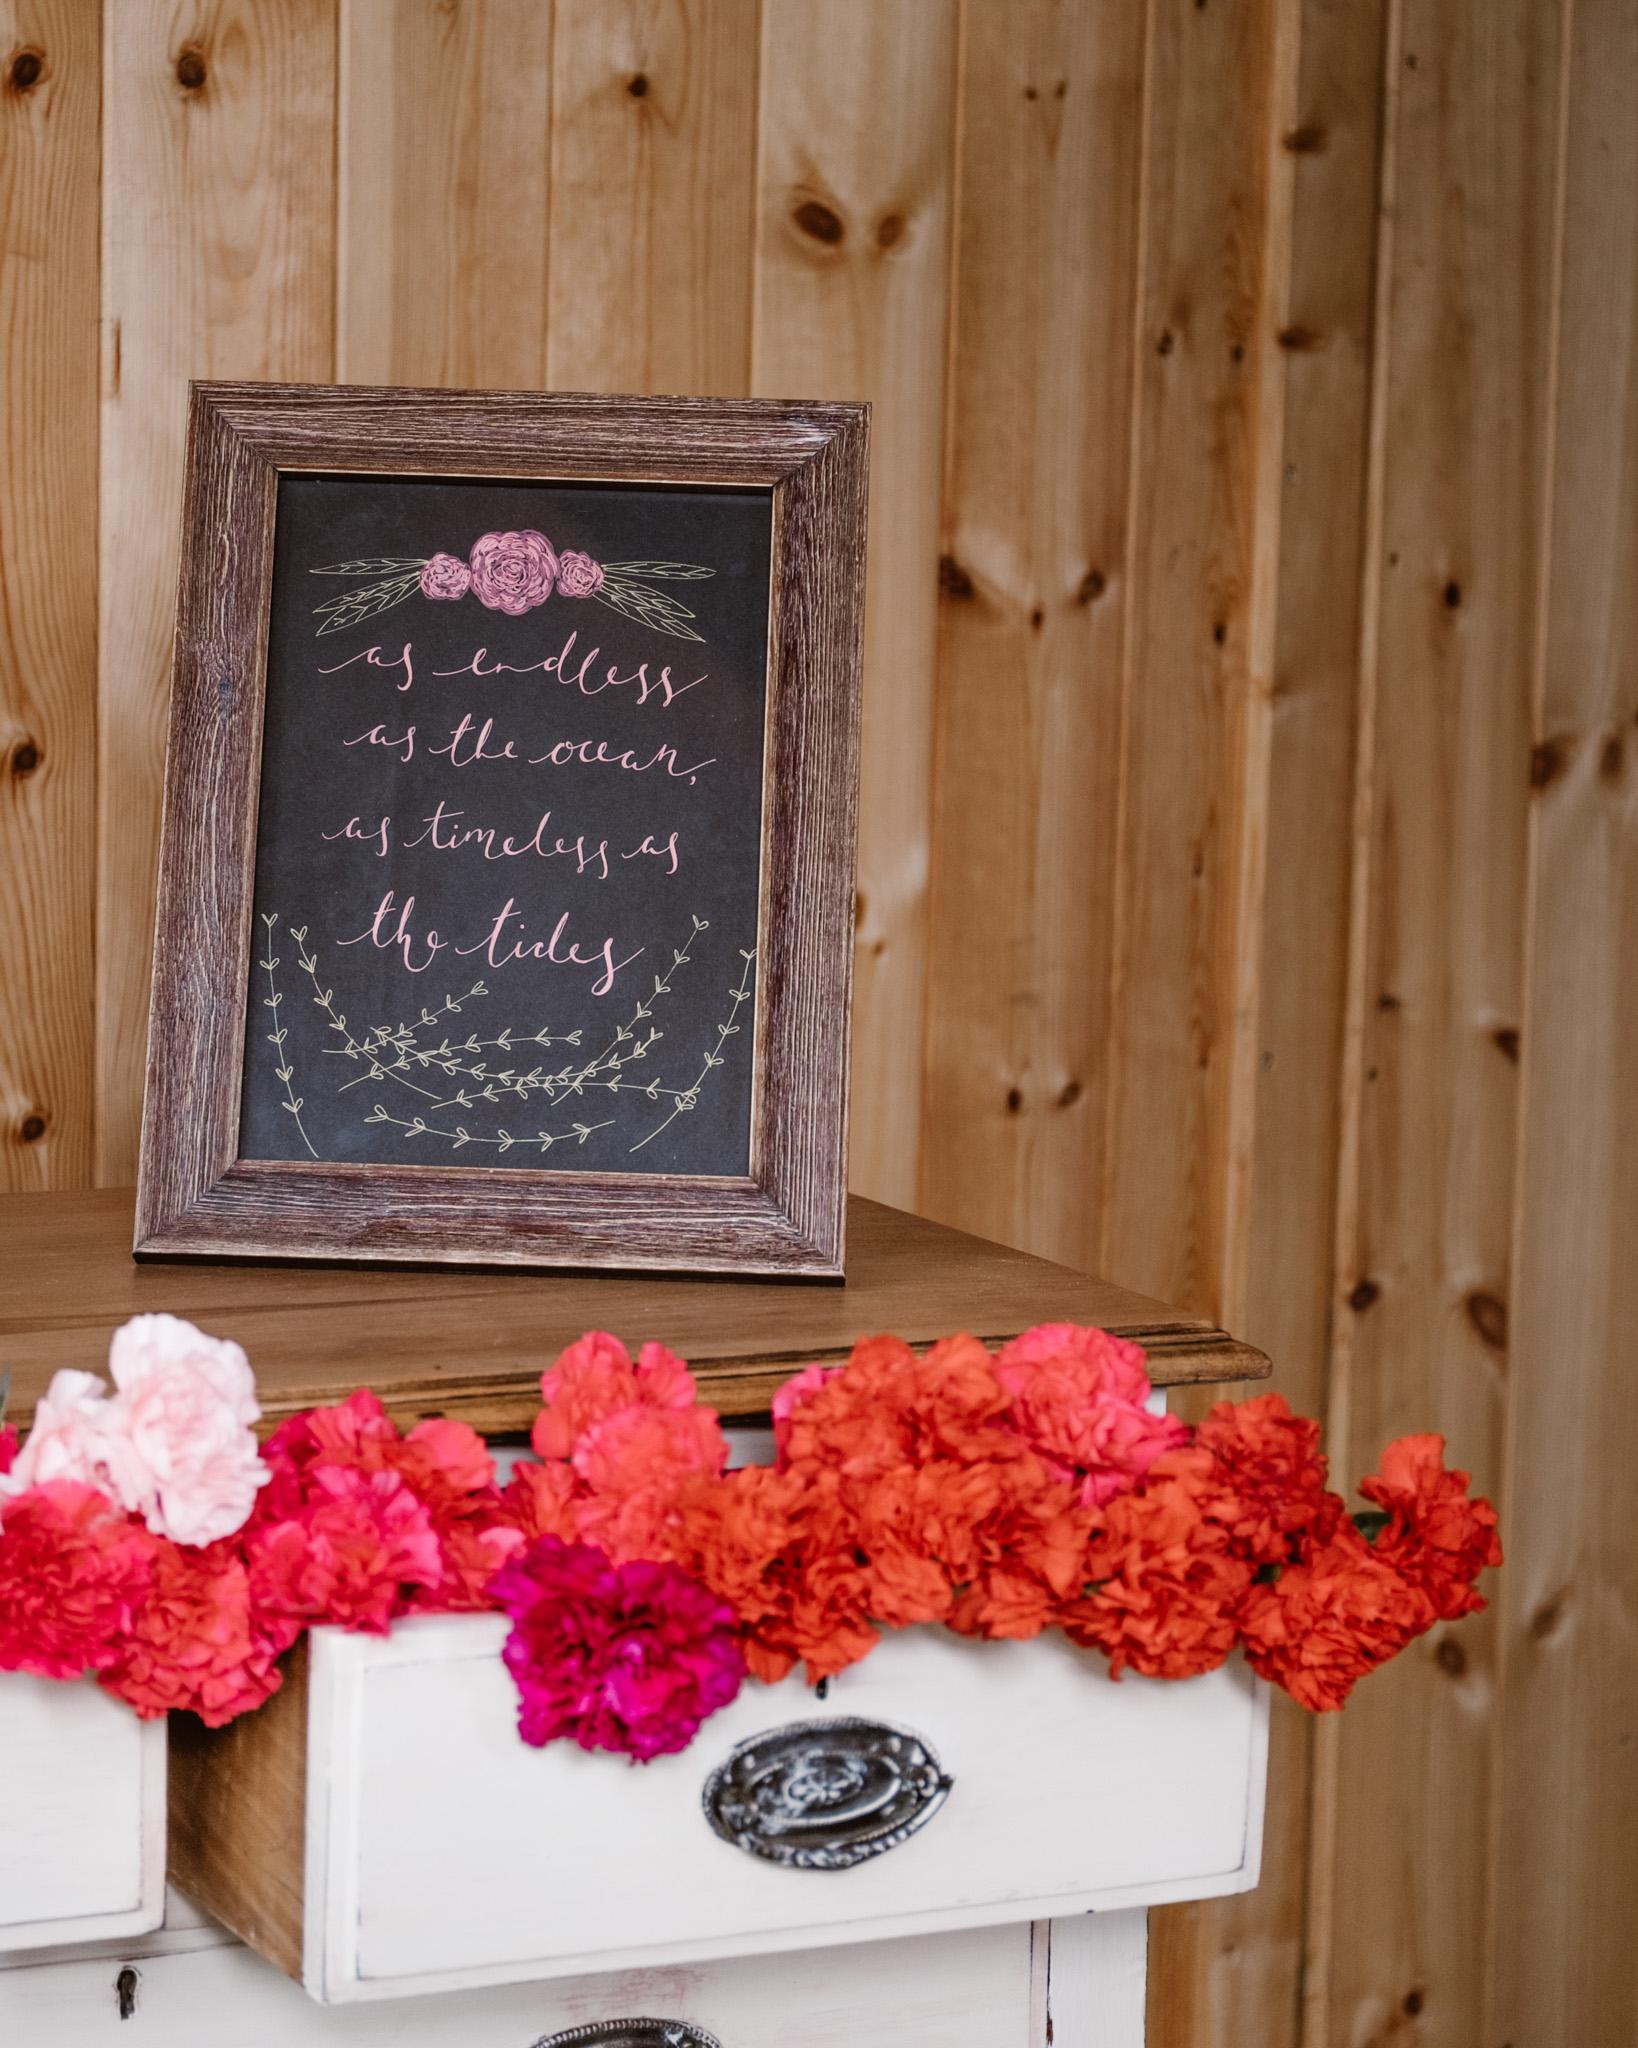 Captains-Wood-Barn-Alterative-Rustic-Vintage-Essex-Wedding-Suffolk-Grace-Elizabeth-29.jpg